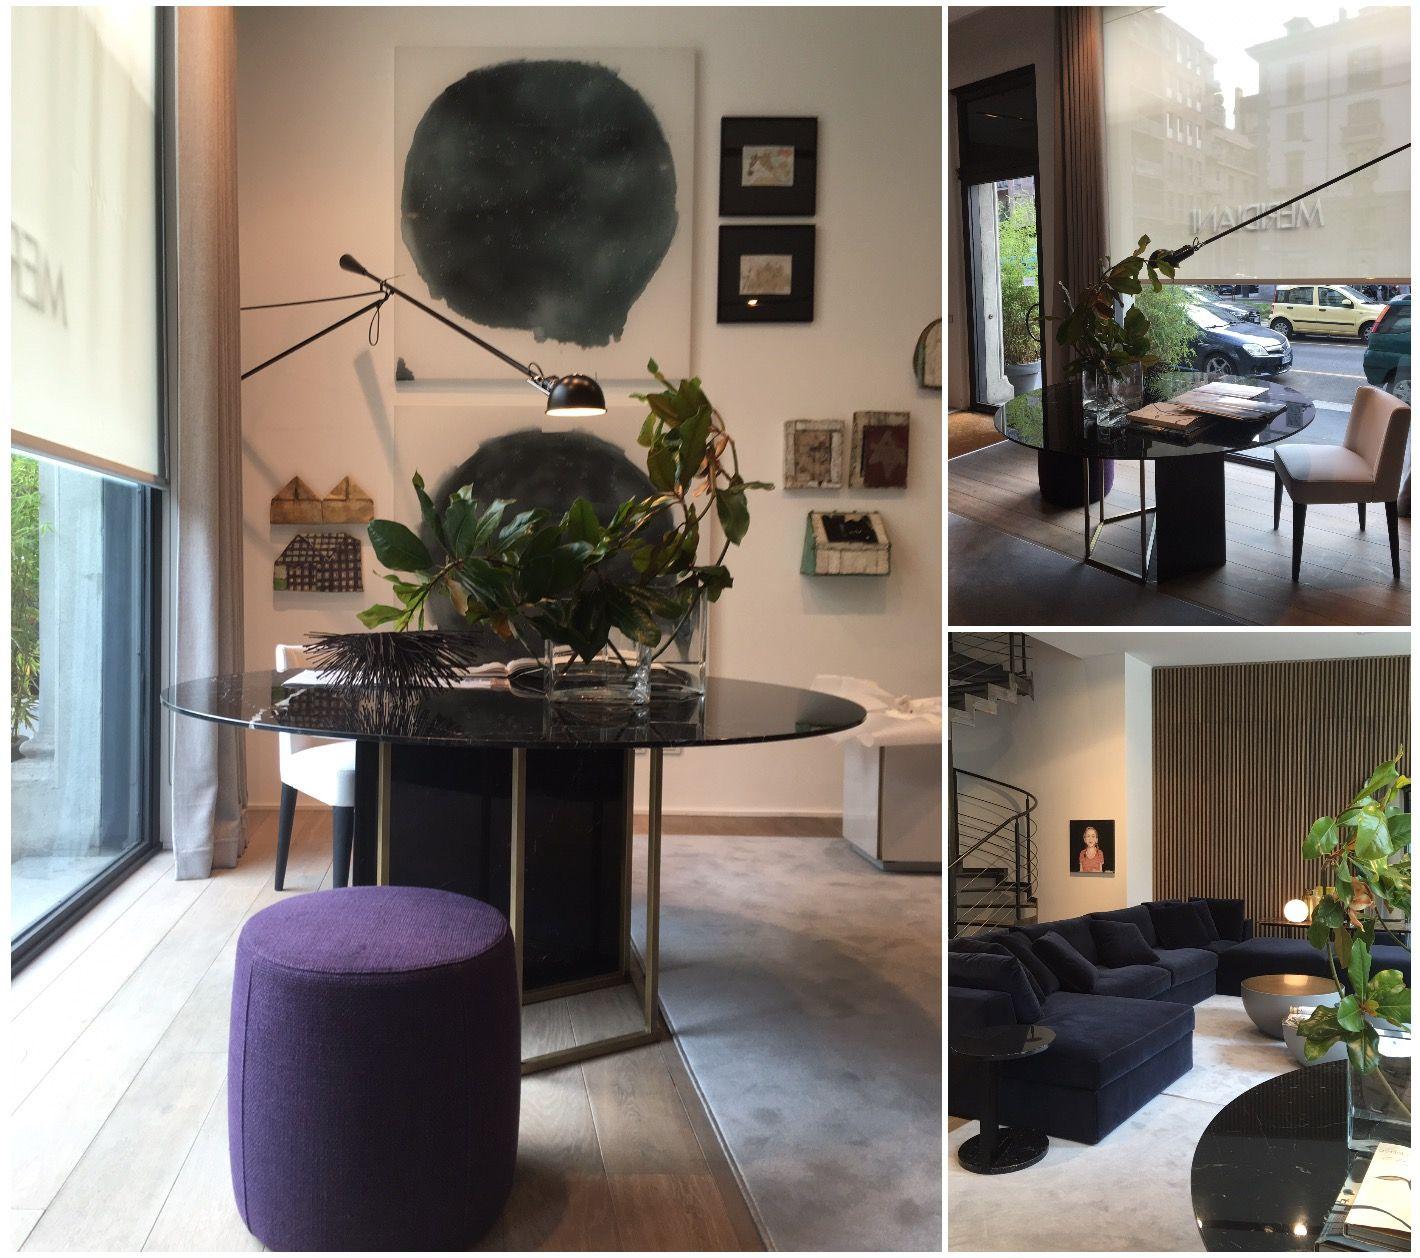 Tavolo plinto divano luis design andrea parisio per meridiani andrea parisio pinterest - Tavolo per divano ...